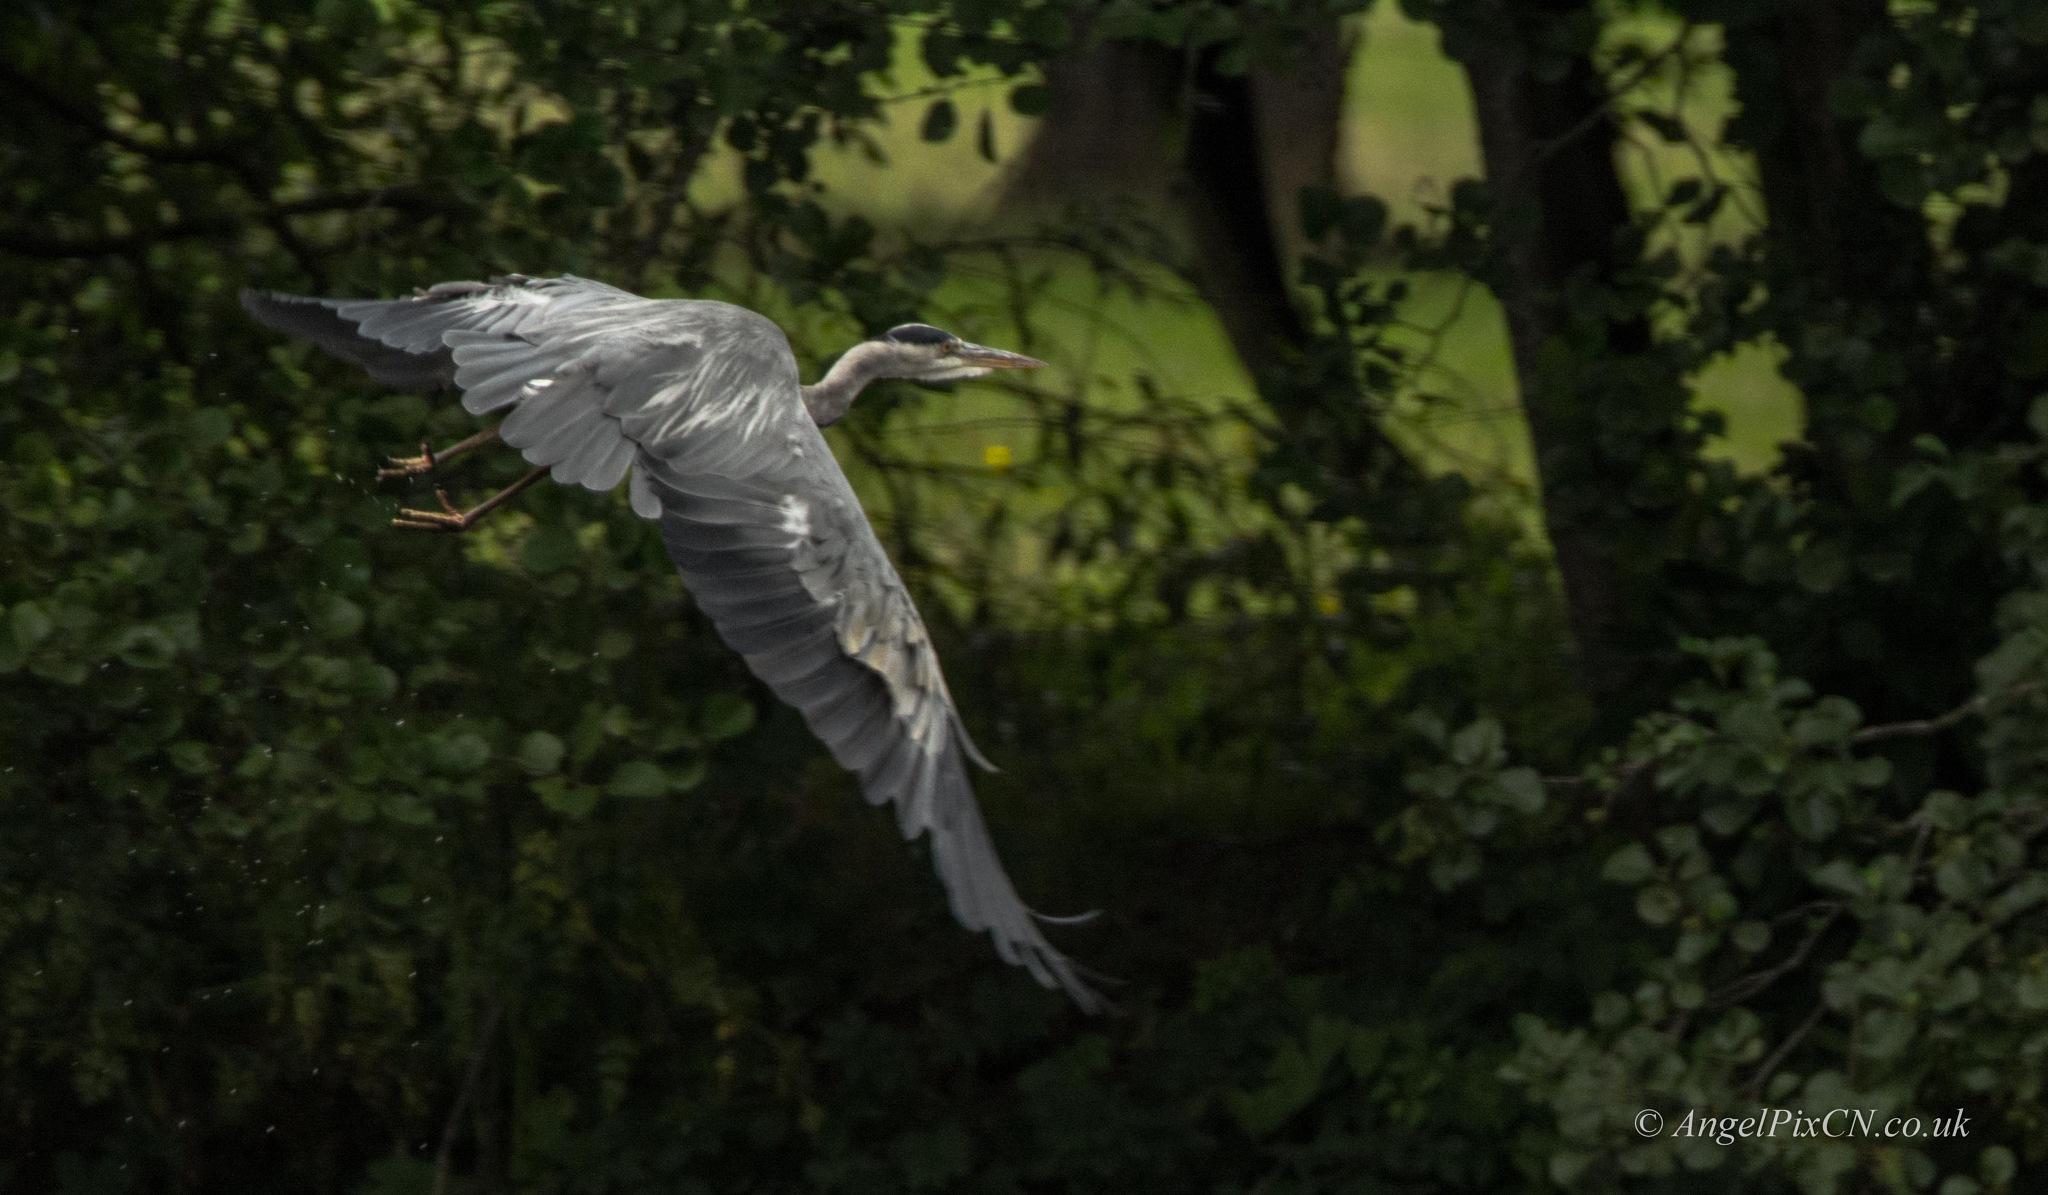 Caught in flight by AngelPixCN